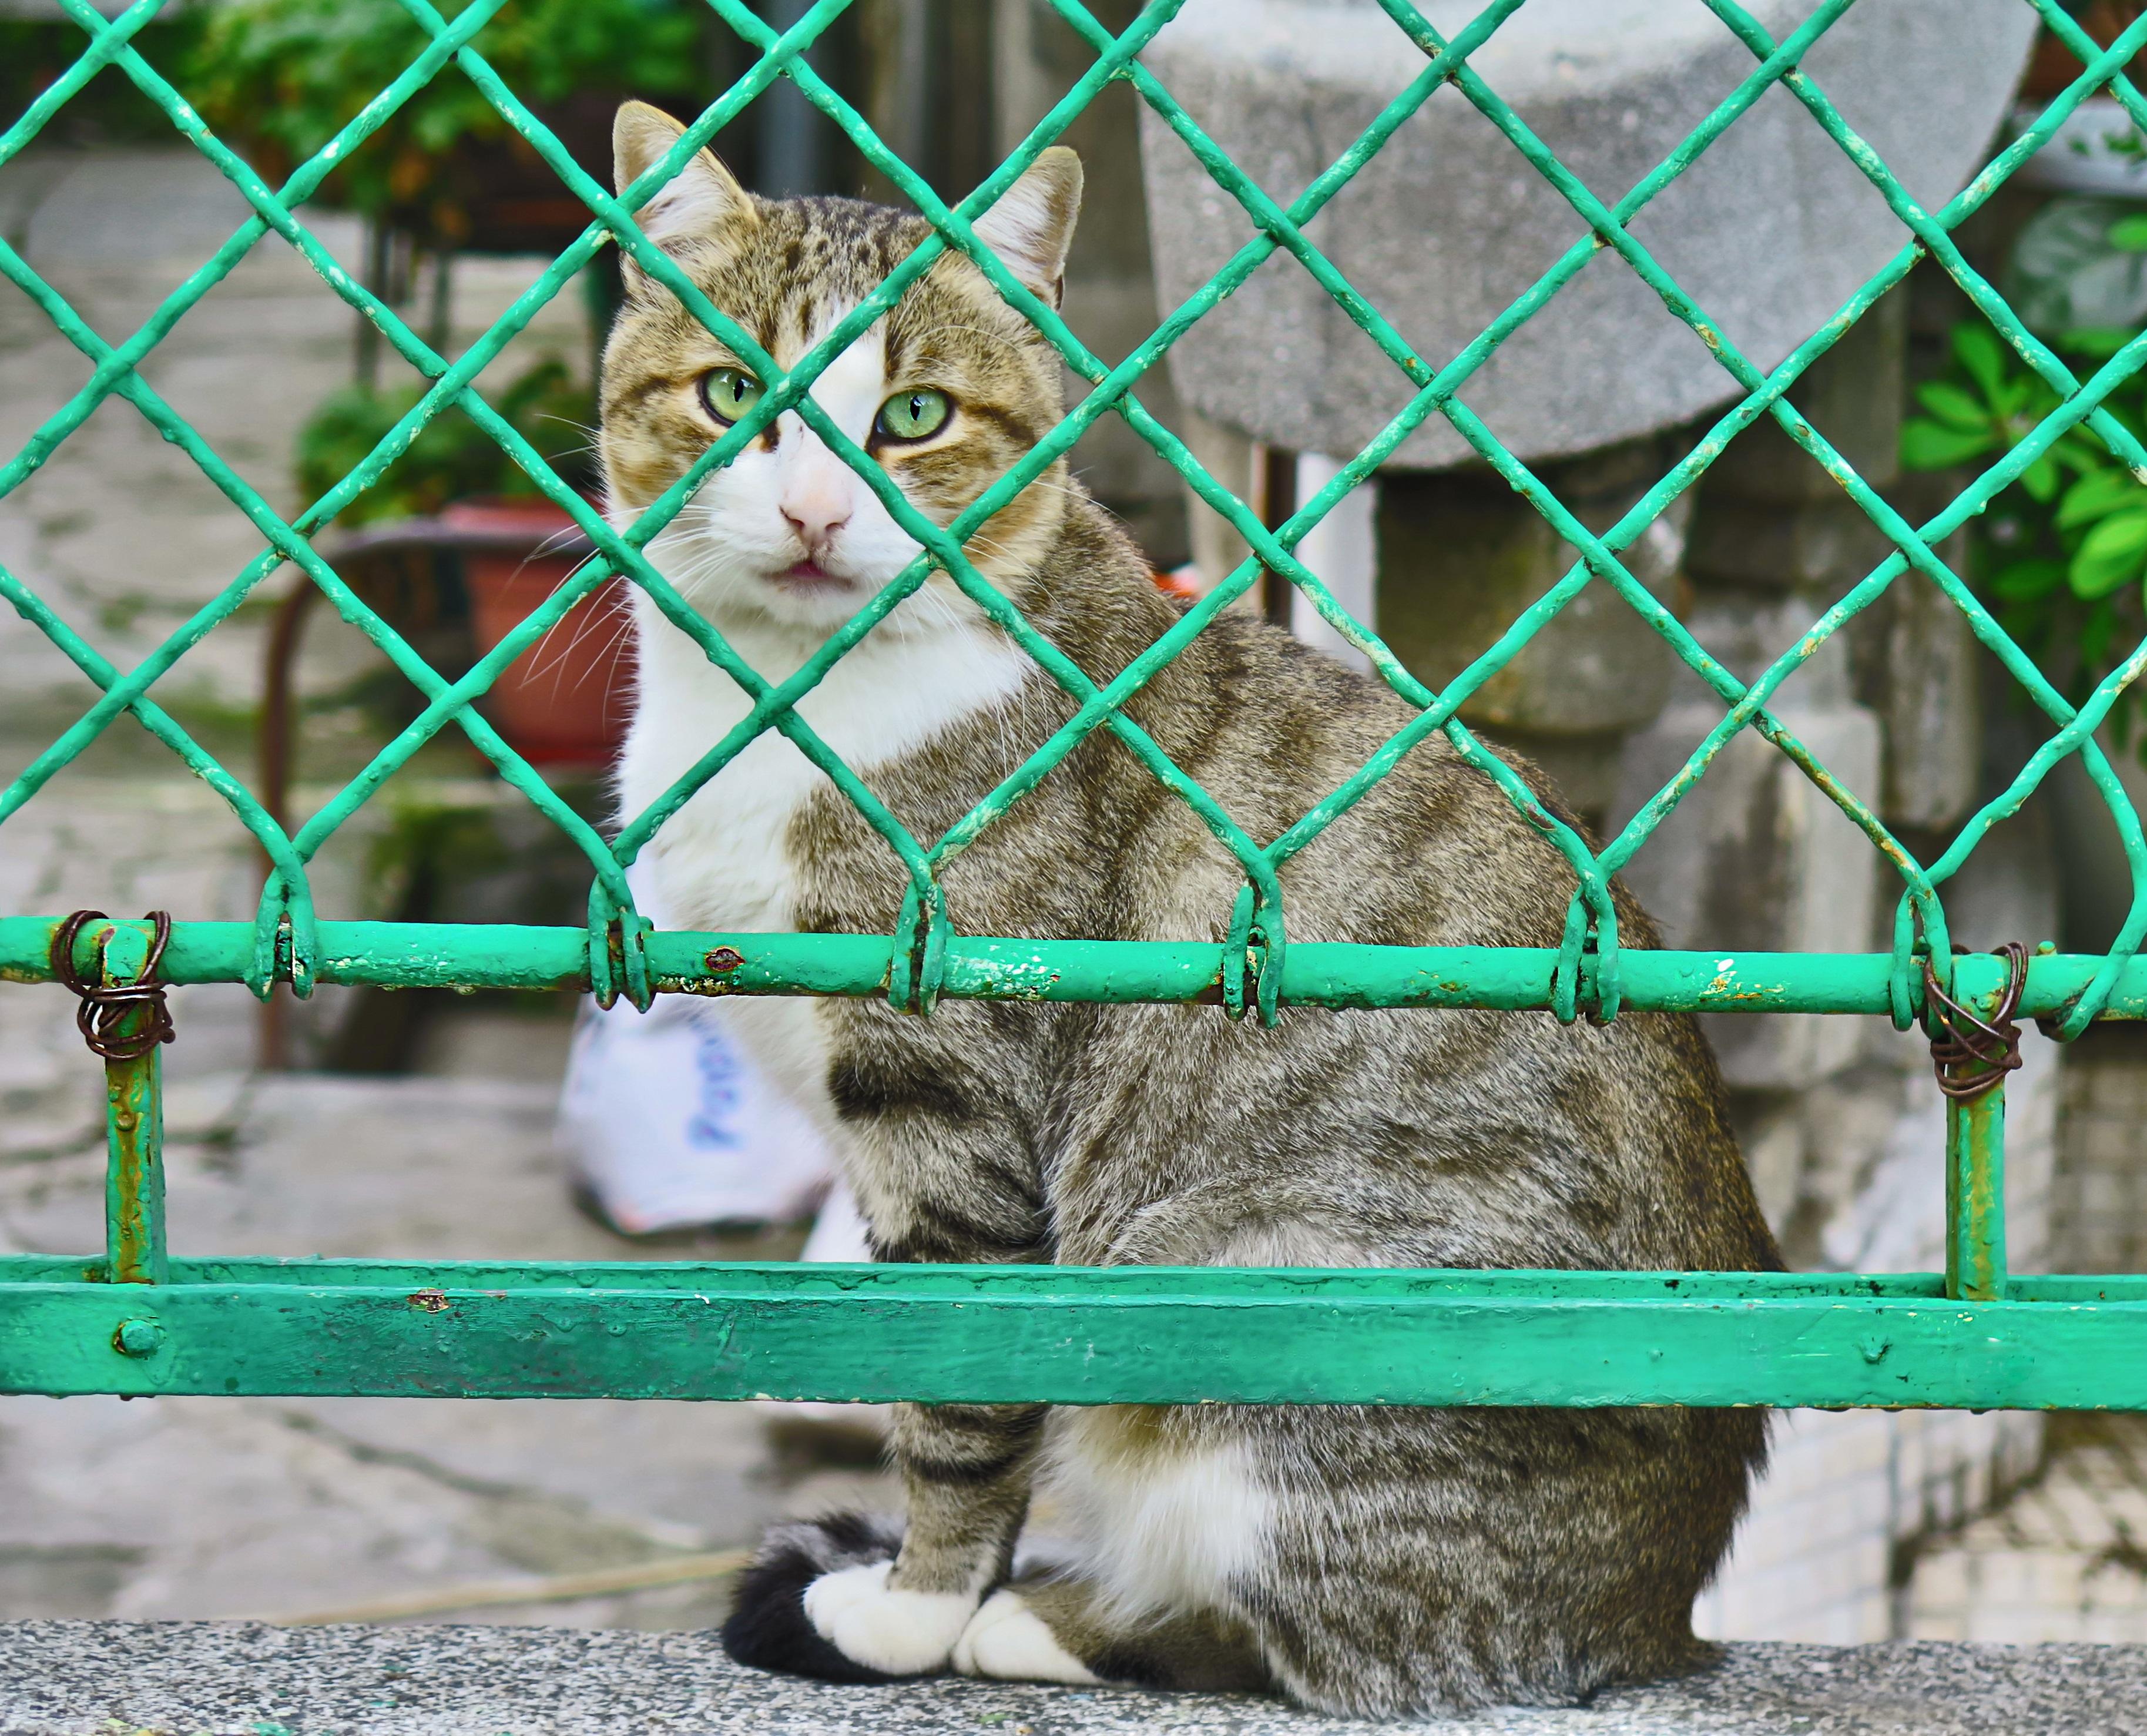 Free Images : fence, zoo, pet, fur, portrait, kitten, mammal, fauna ...